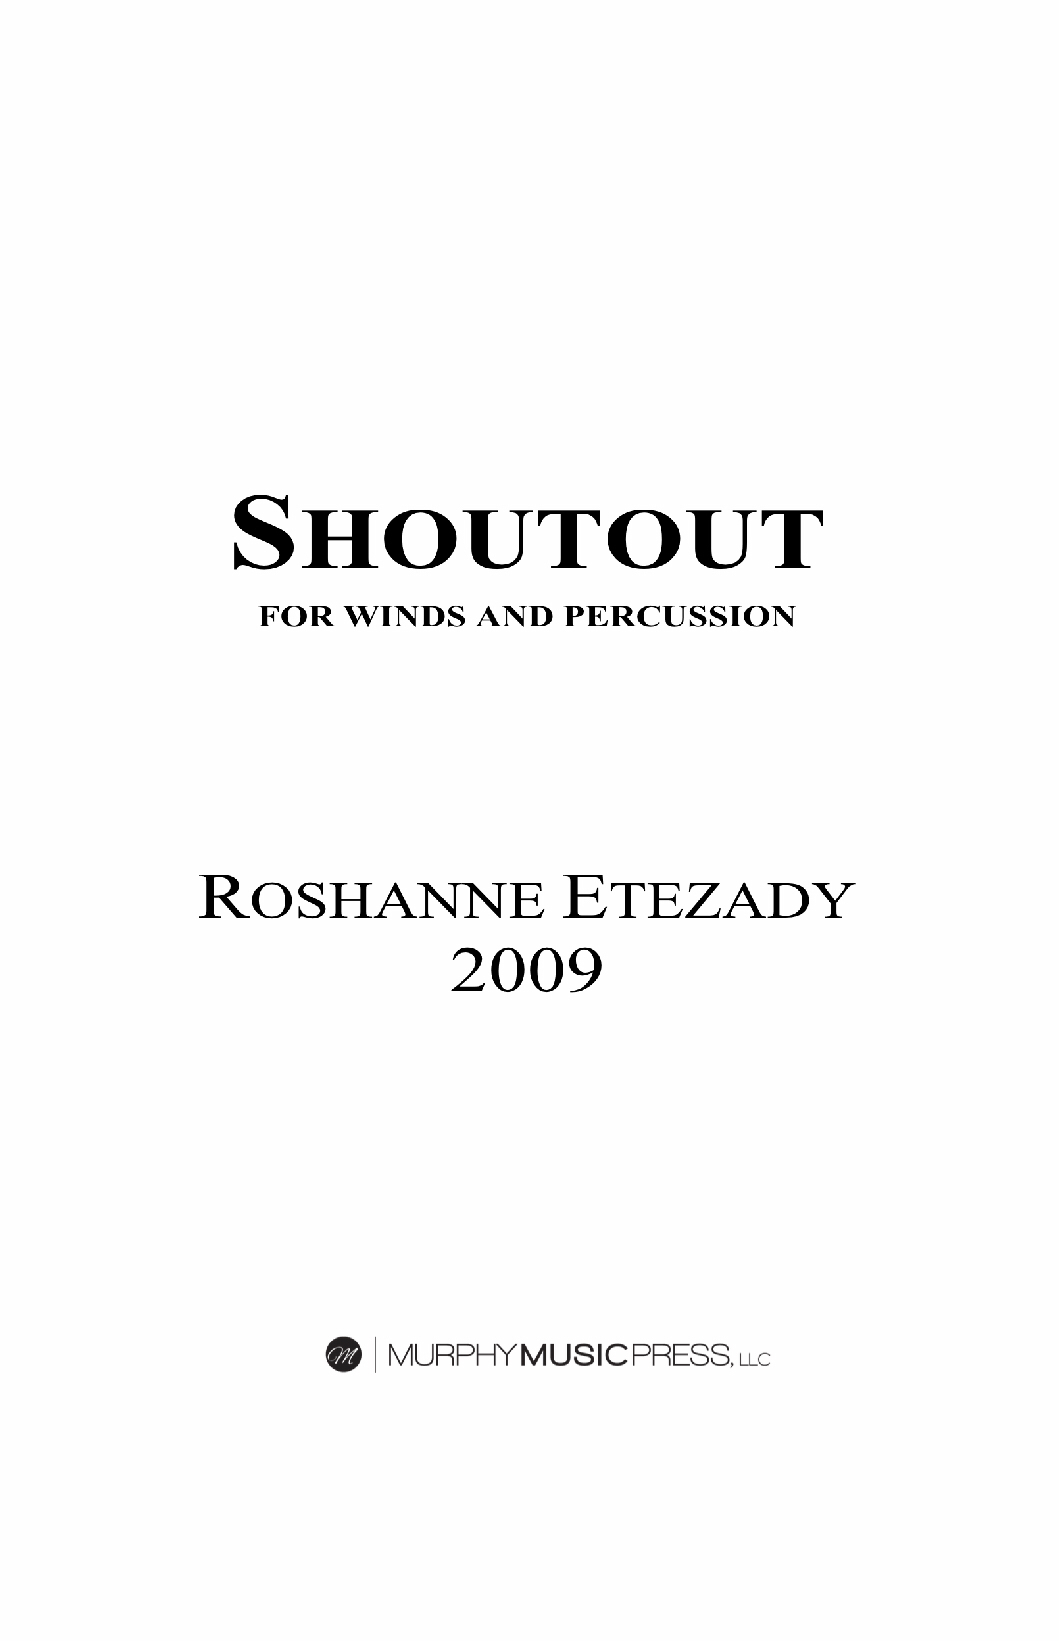 Shoutout (Score Only) by Roshanne Etezady